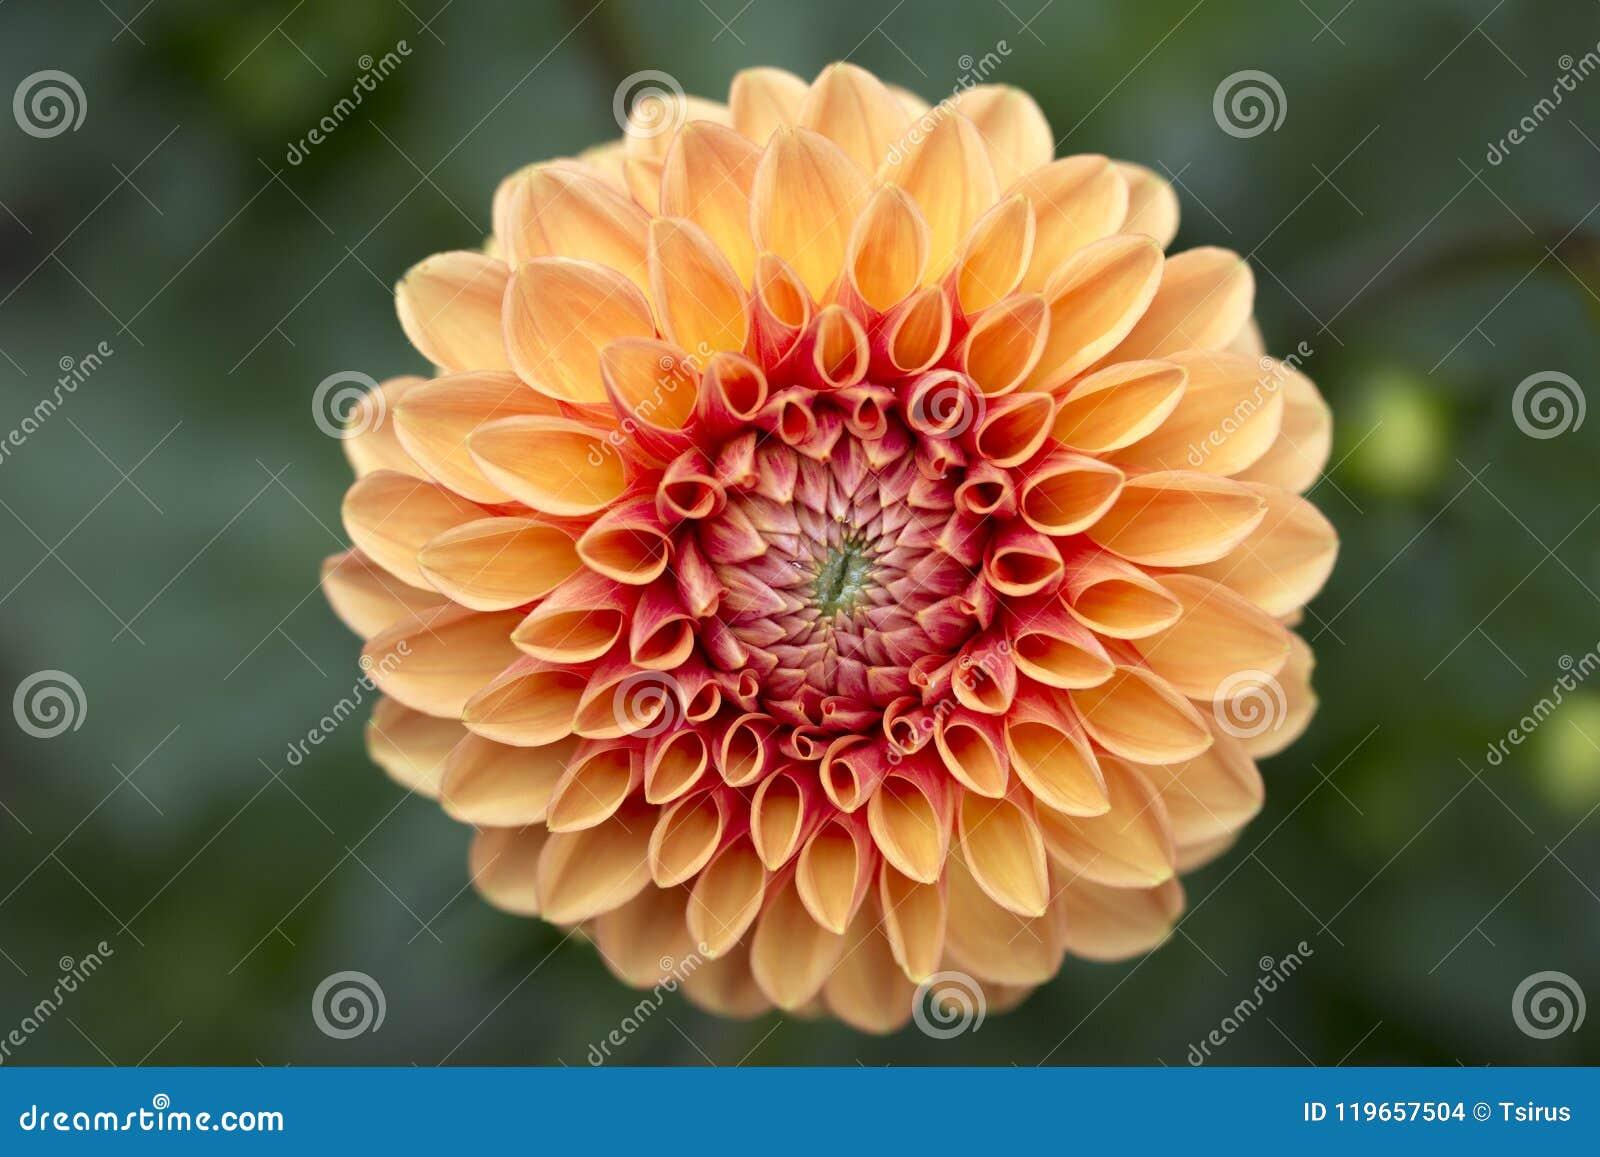 Abstract Macro Of Orange Dahlia Flower Stock Photo Image Of